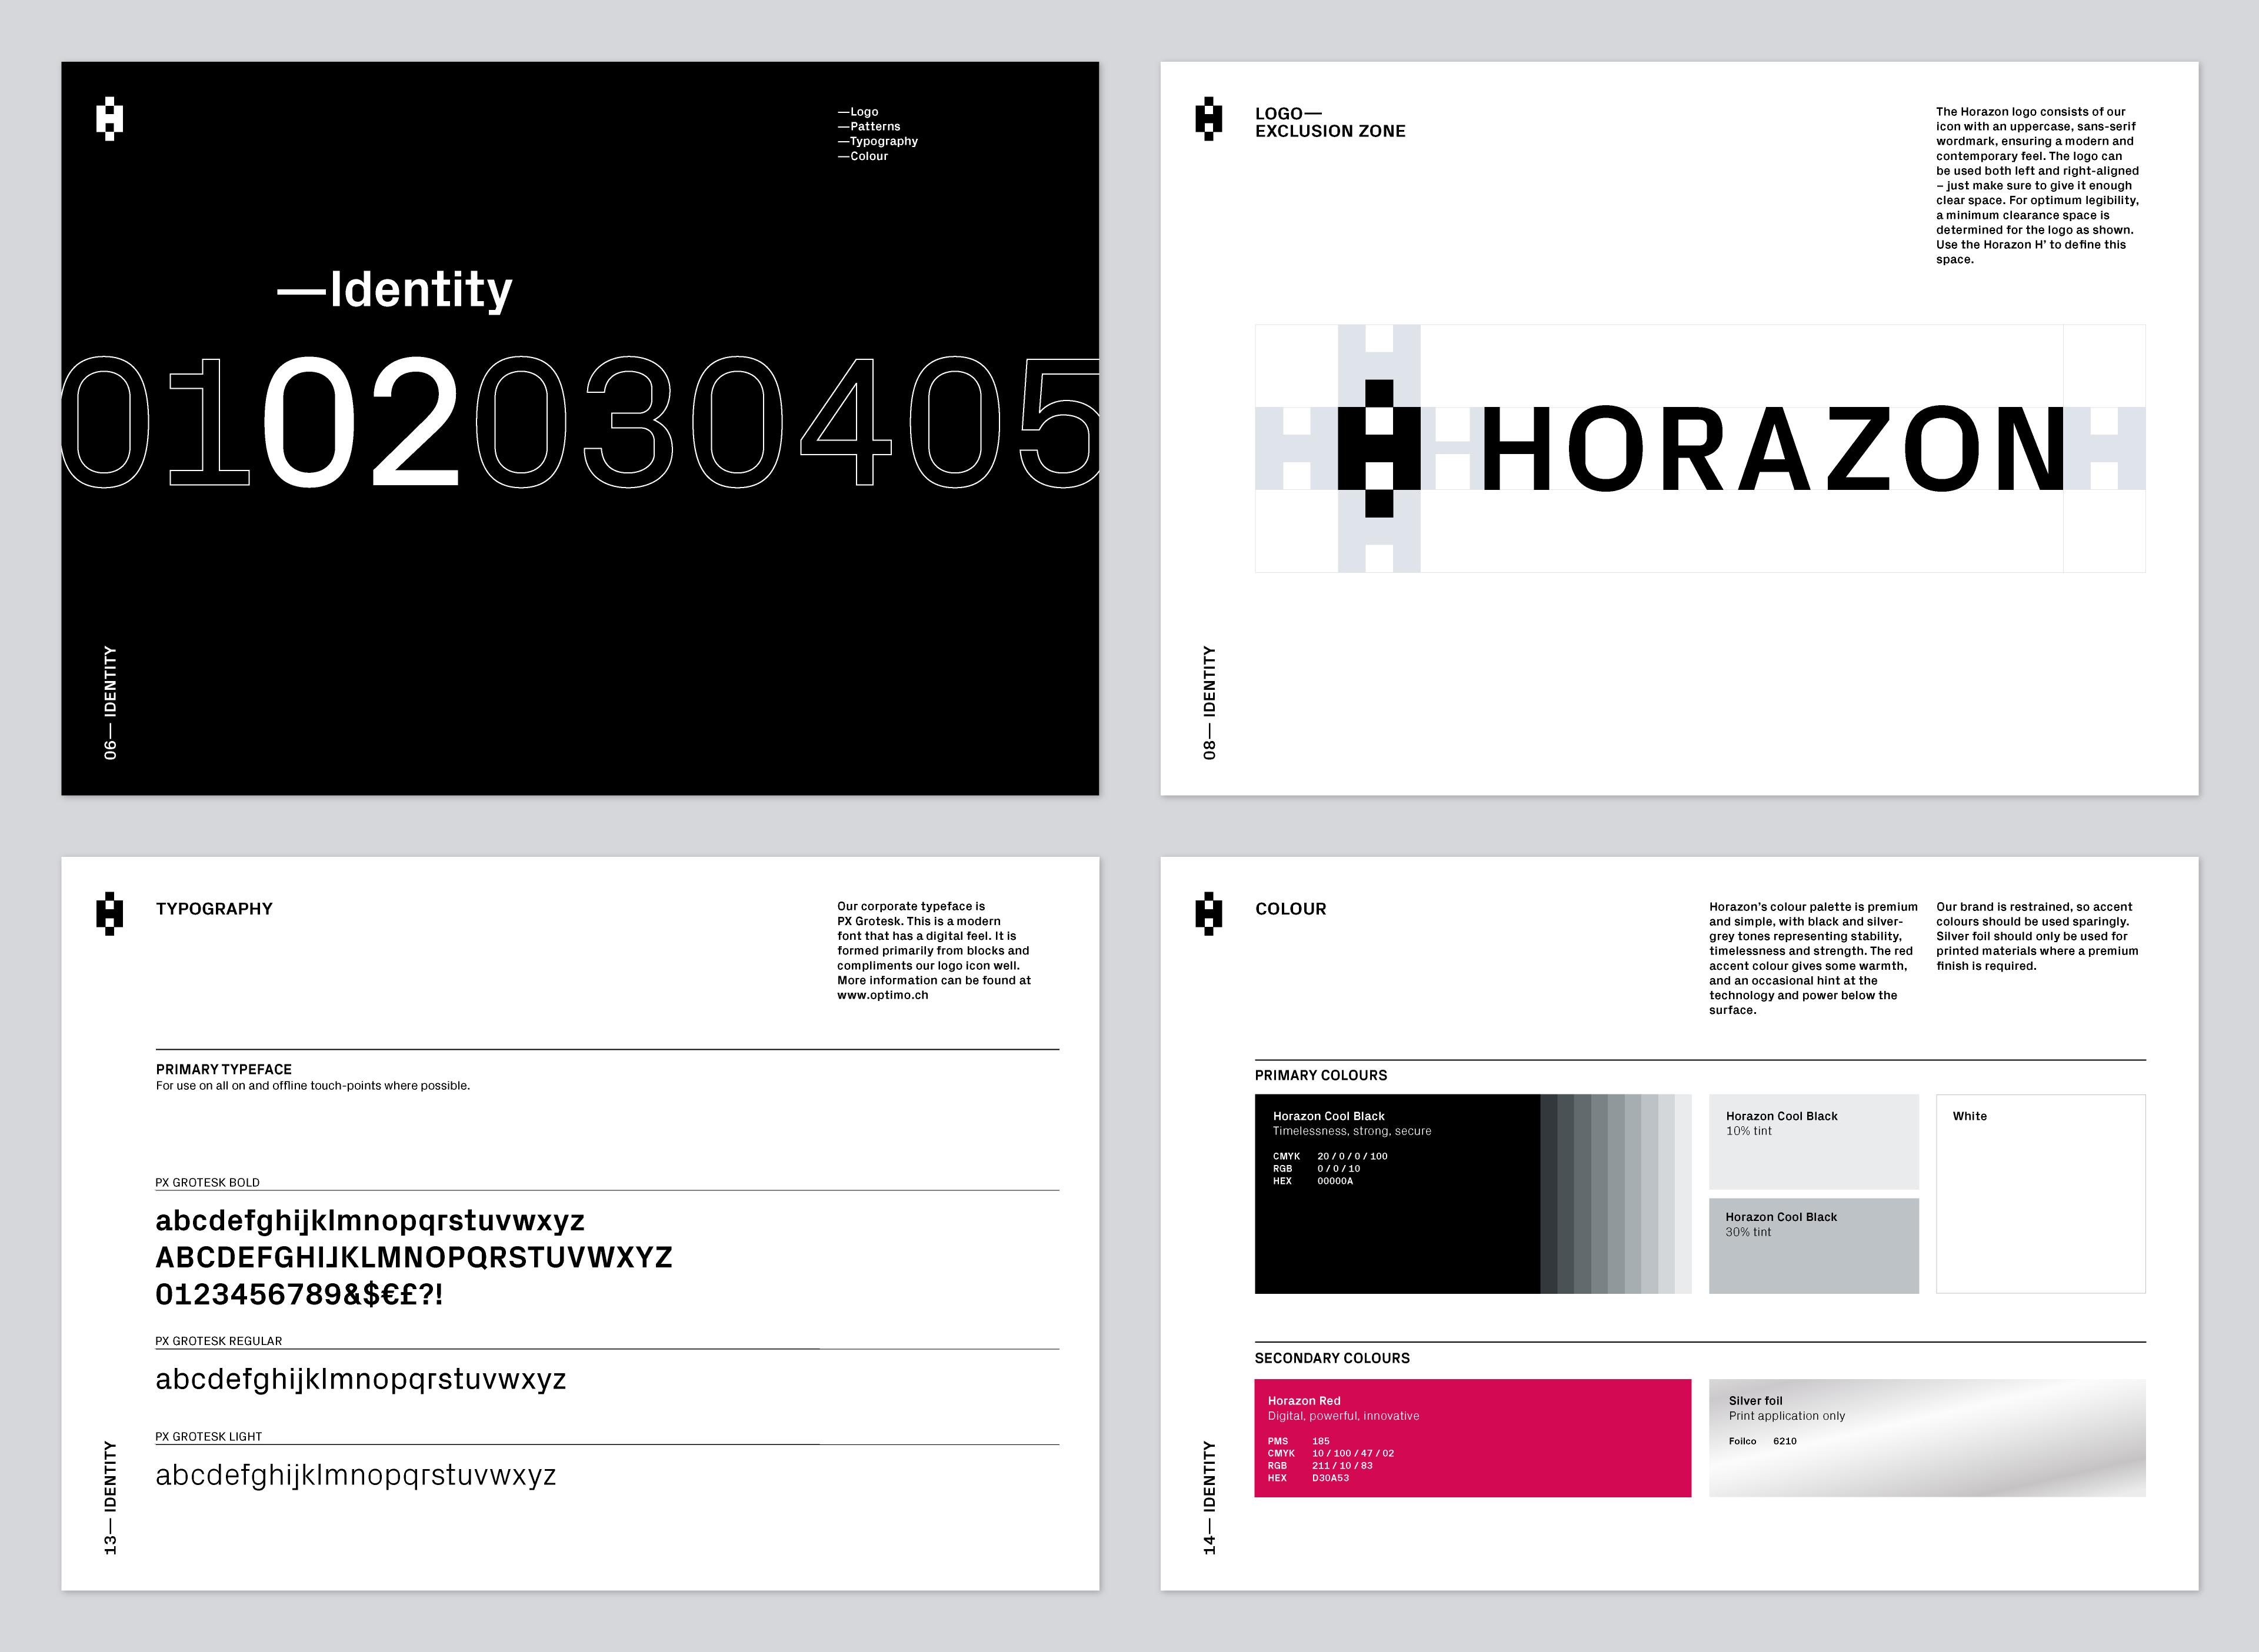 horazon-brand-guidelines-02